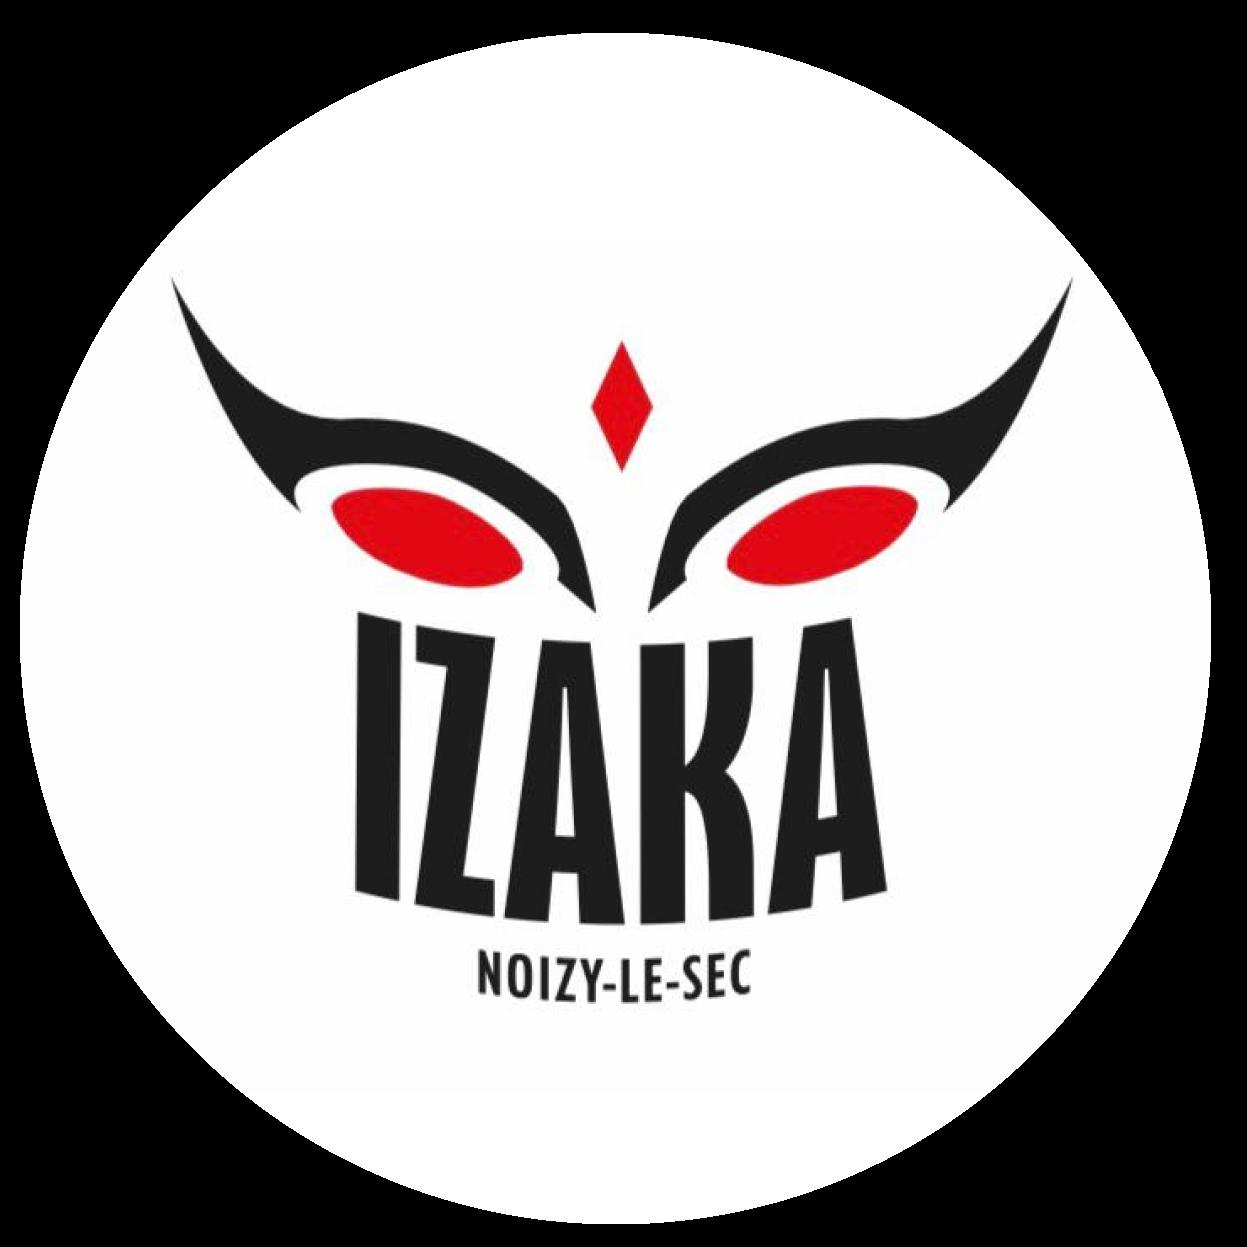 Membership + Vote for IZAKA